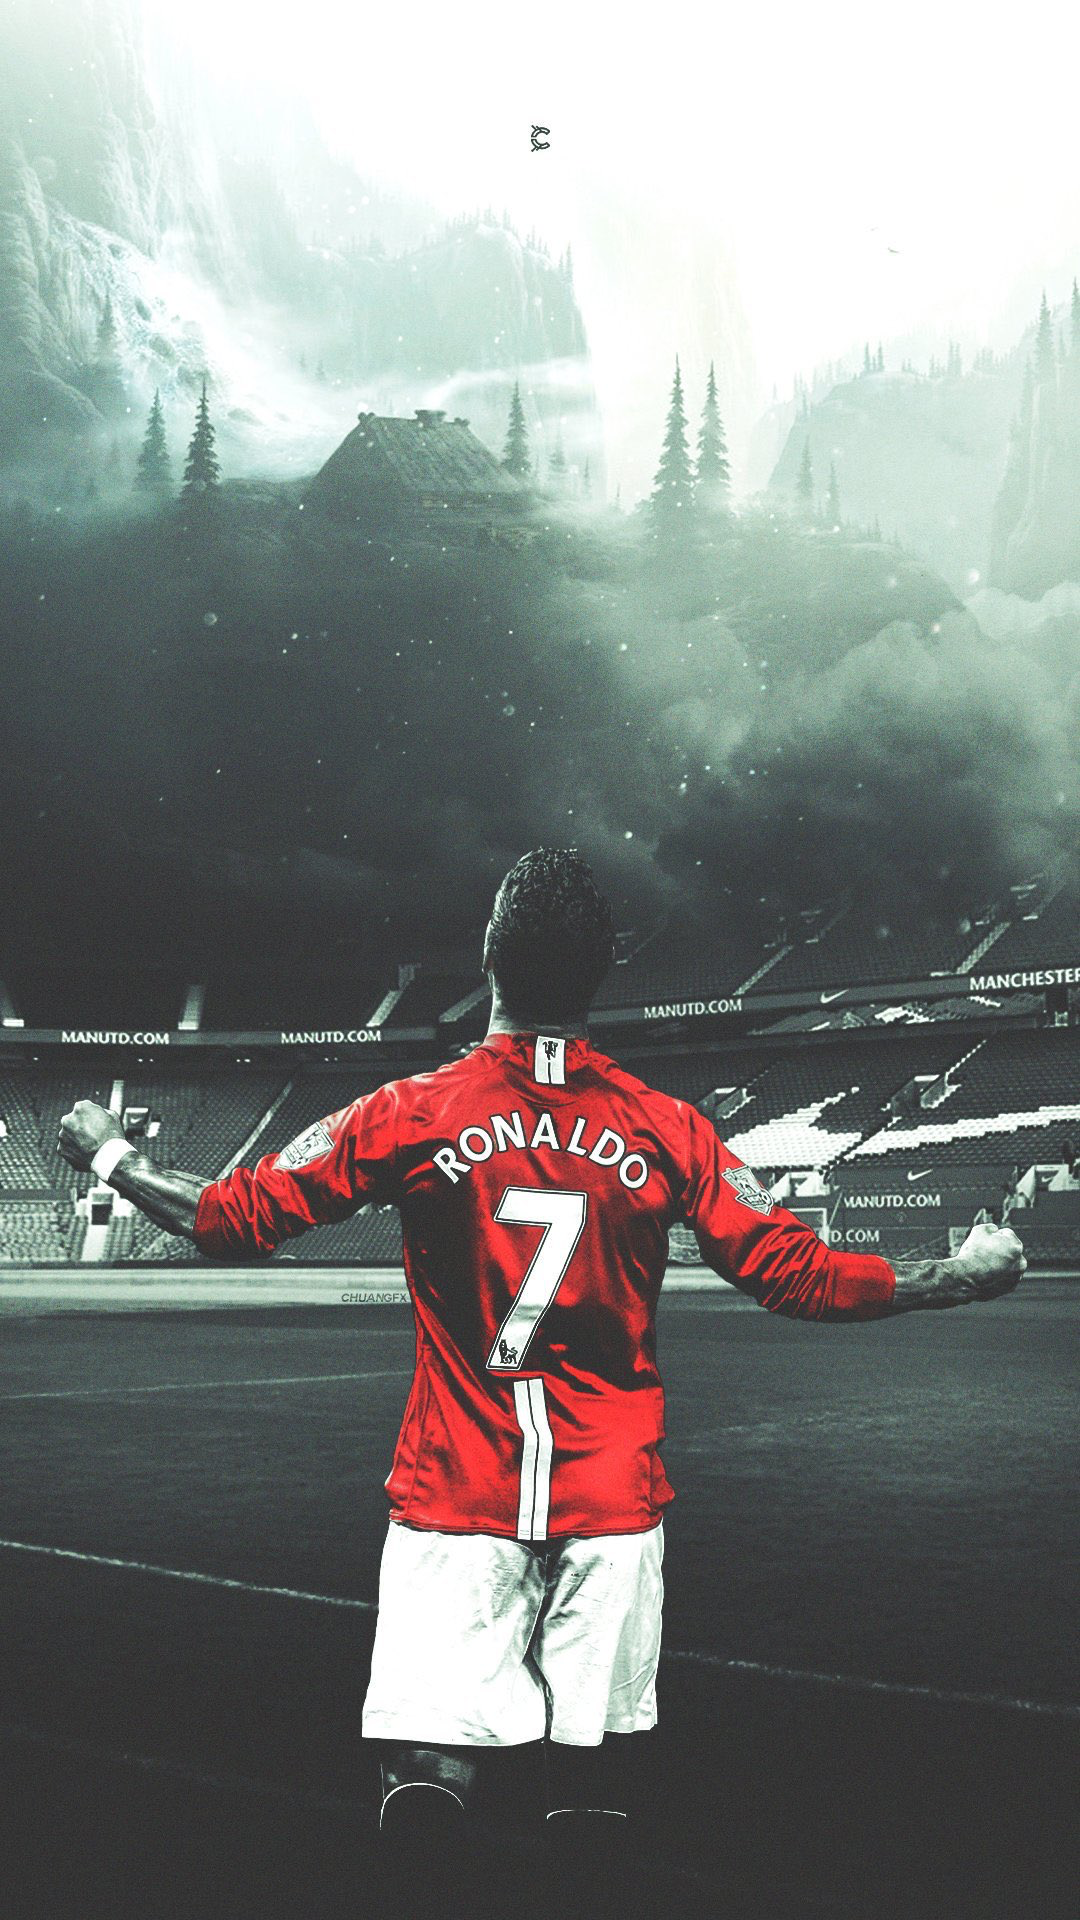 Ronaldo Cristiano Ronaldo Manchester Cristiano Ronaldo